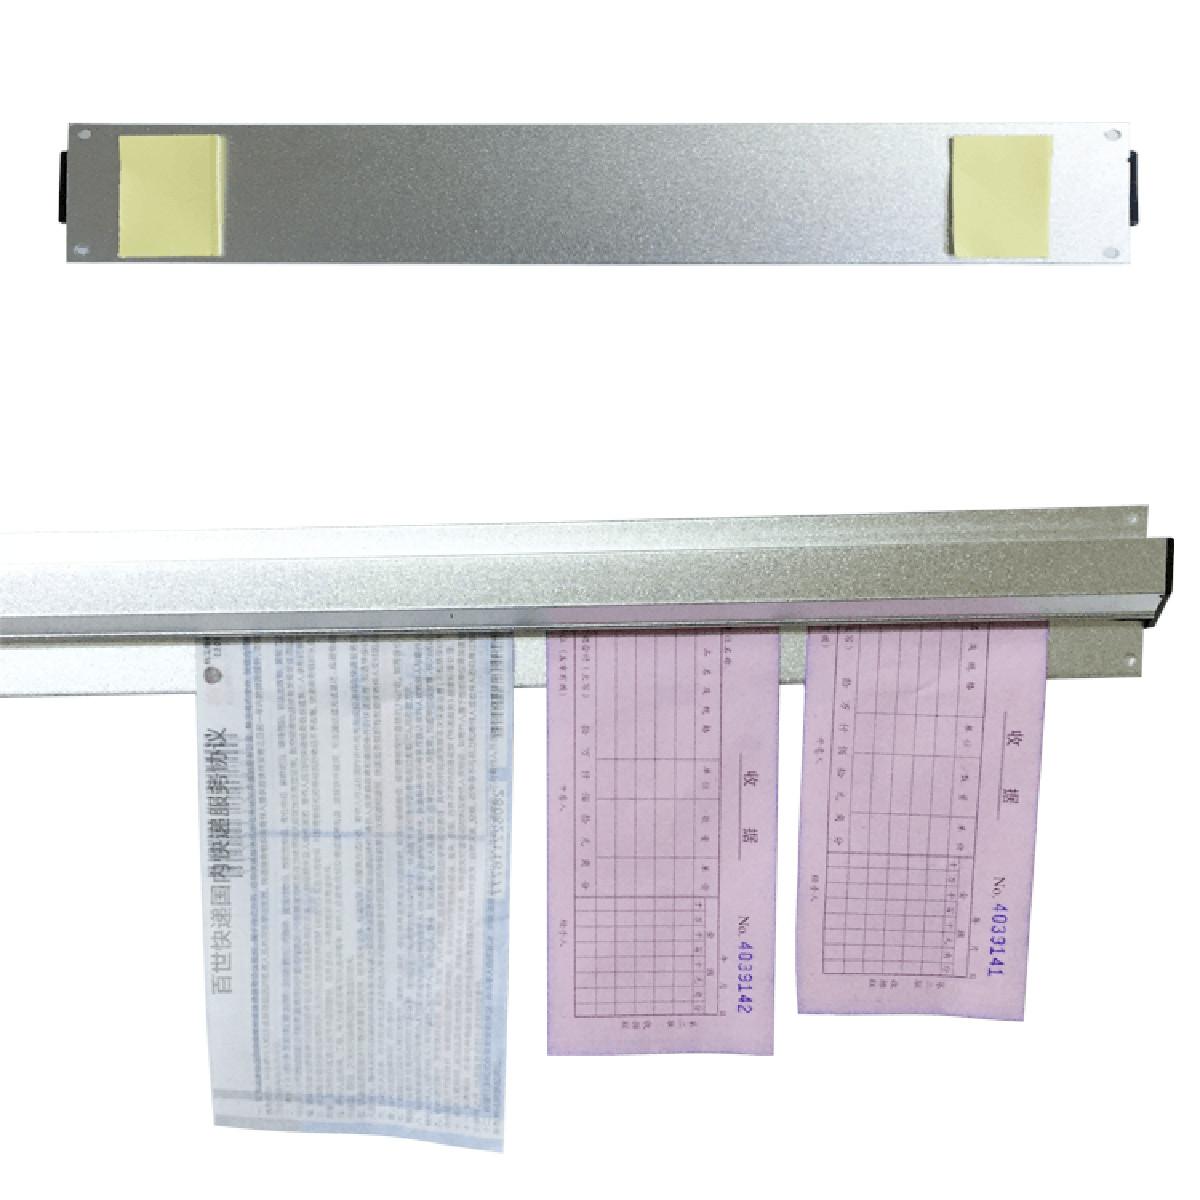 Paper Rail Tab Grabber Bar Receipt Cafe Order Holder Bar Bill Organiser Letter Grip Bill